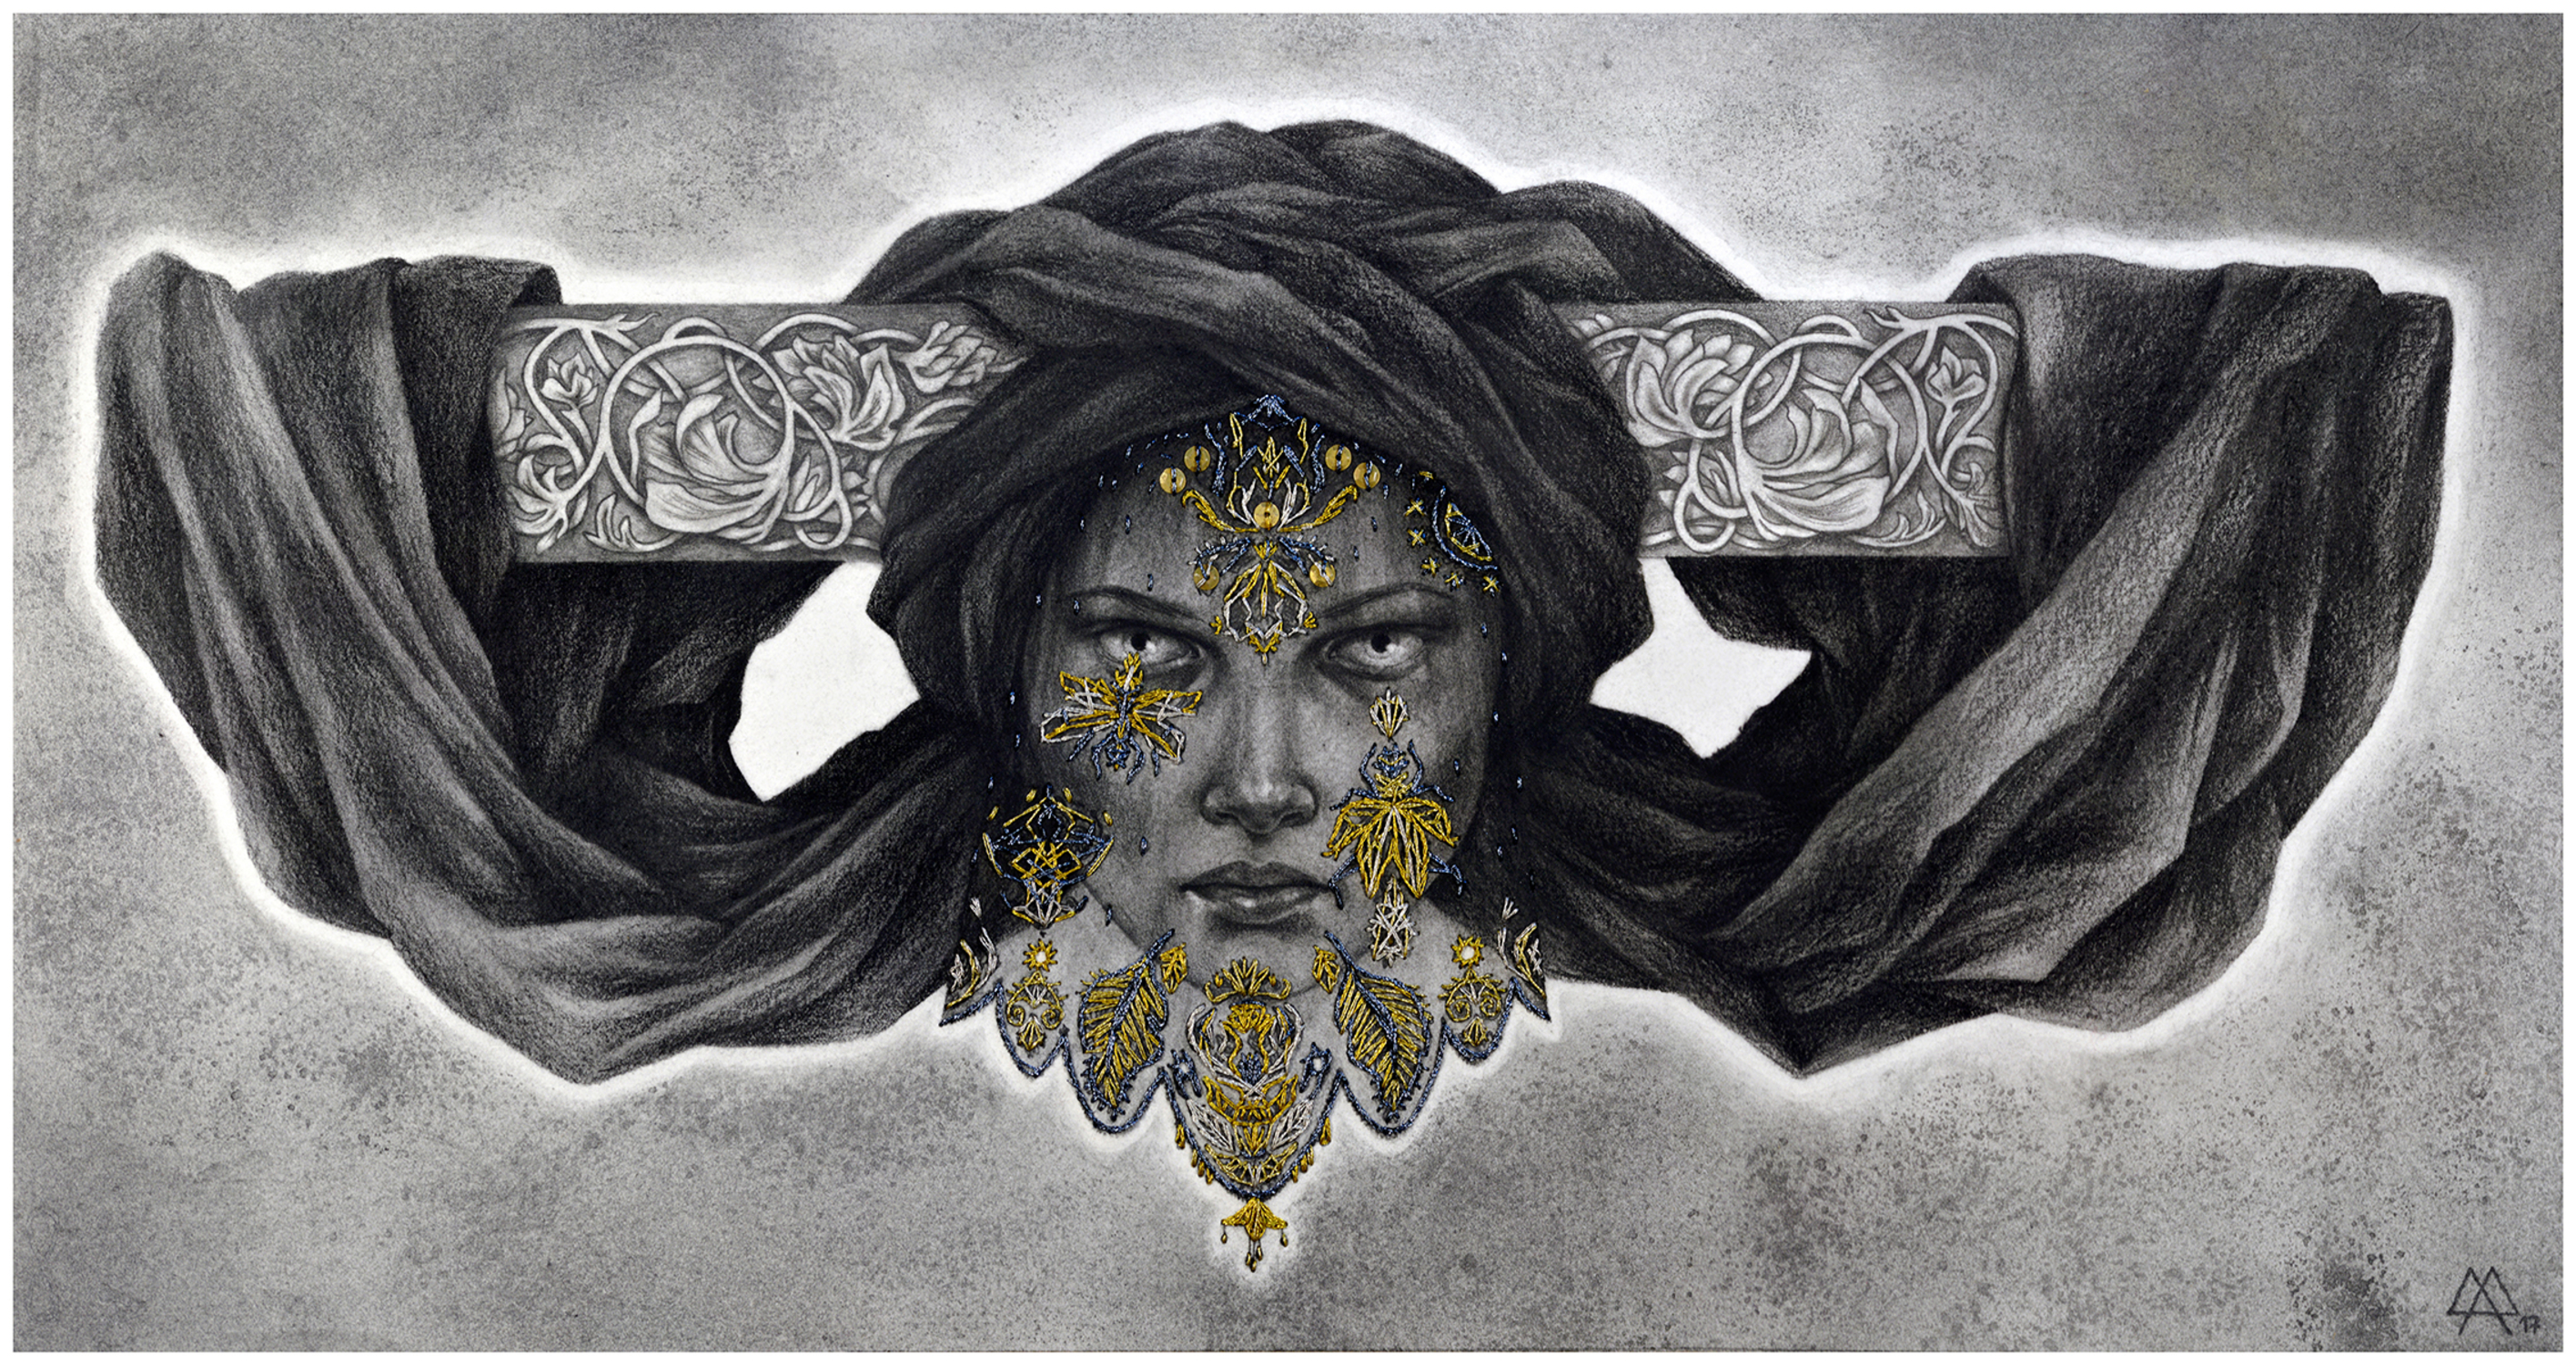 The Veil Artwork by Adeline Martin